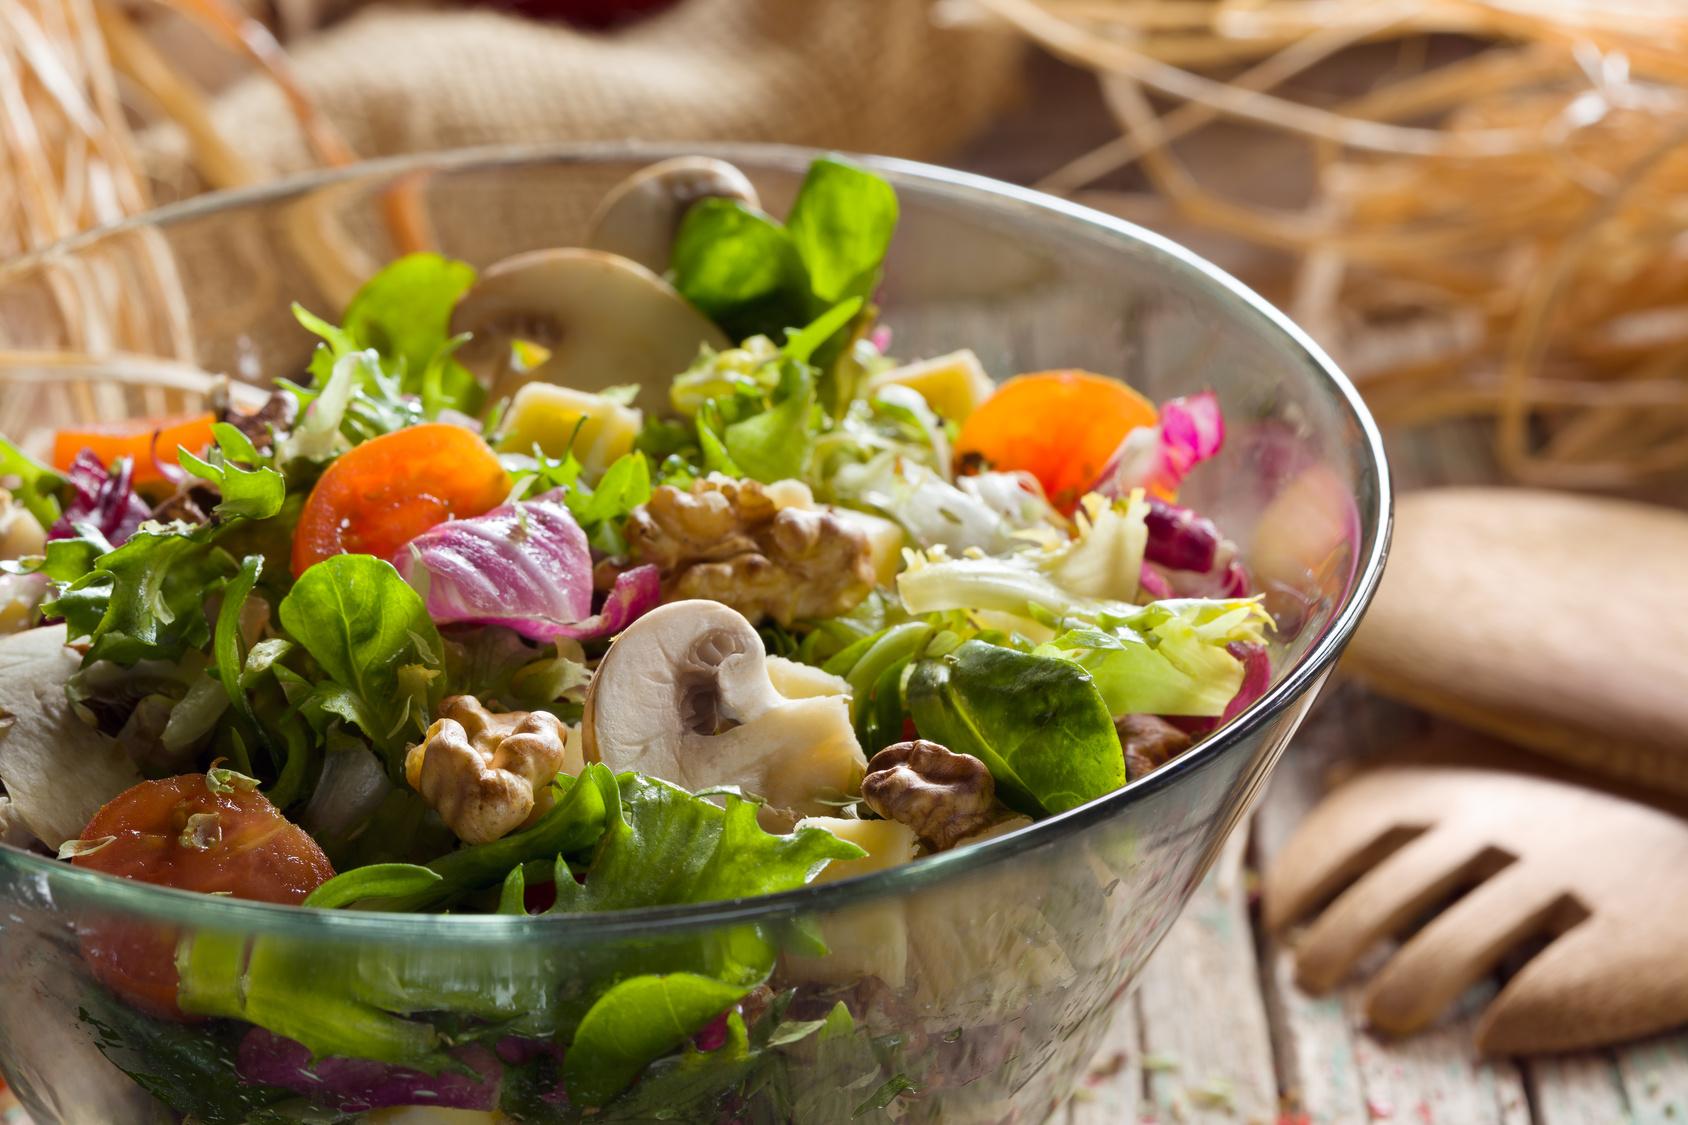 Les salades de la mer rafraîchissent l'été